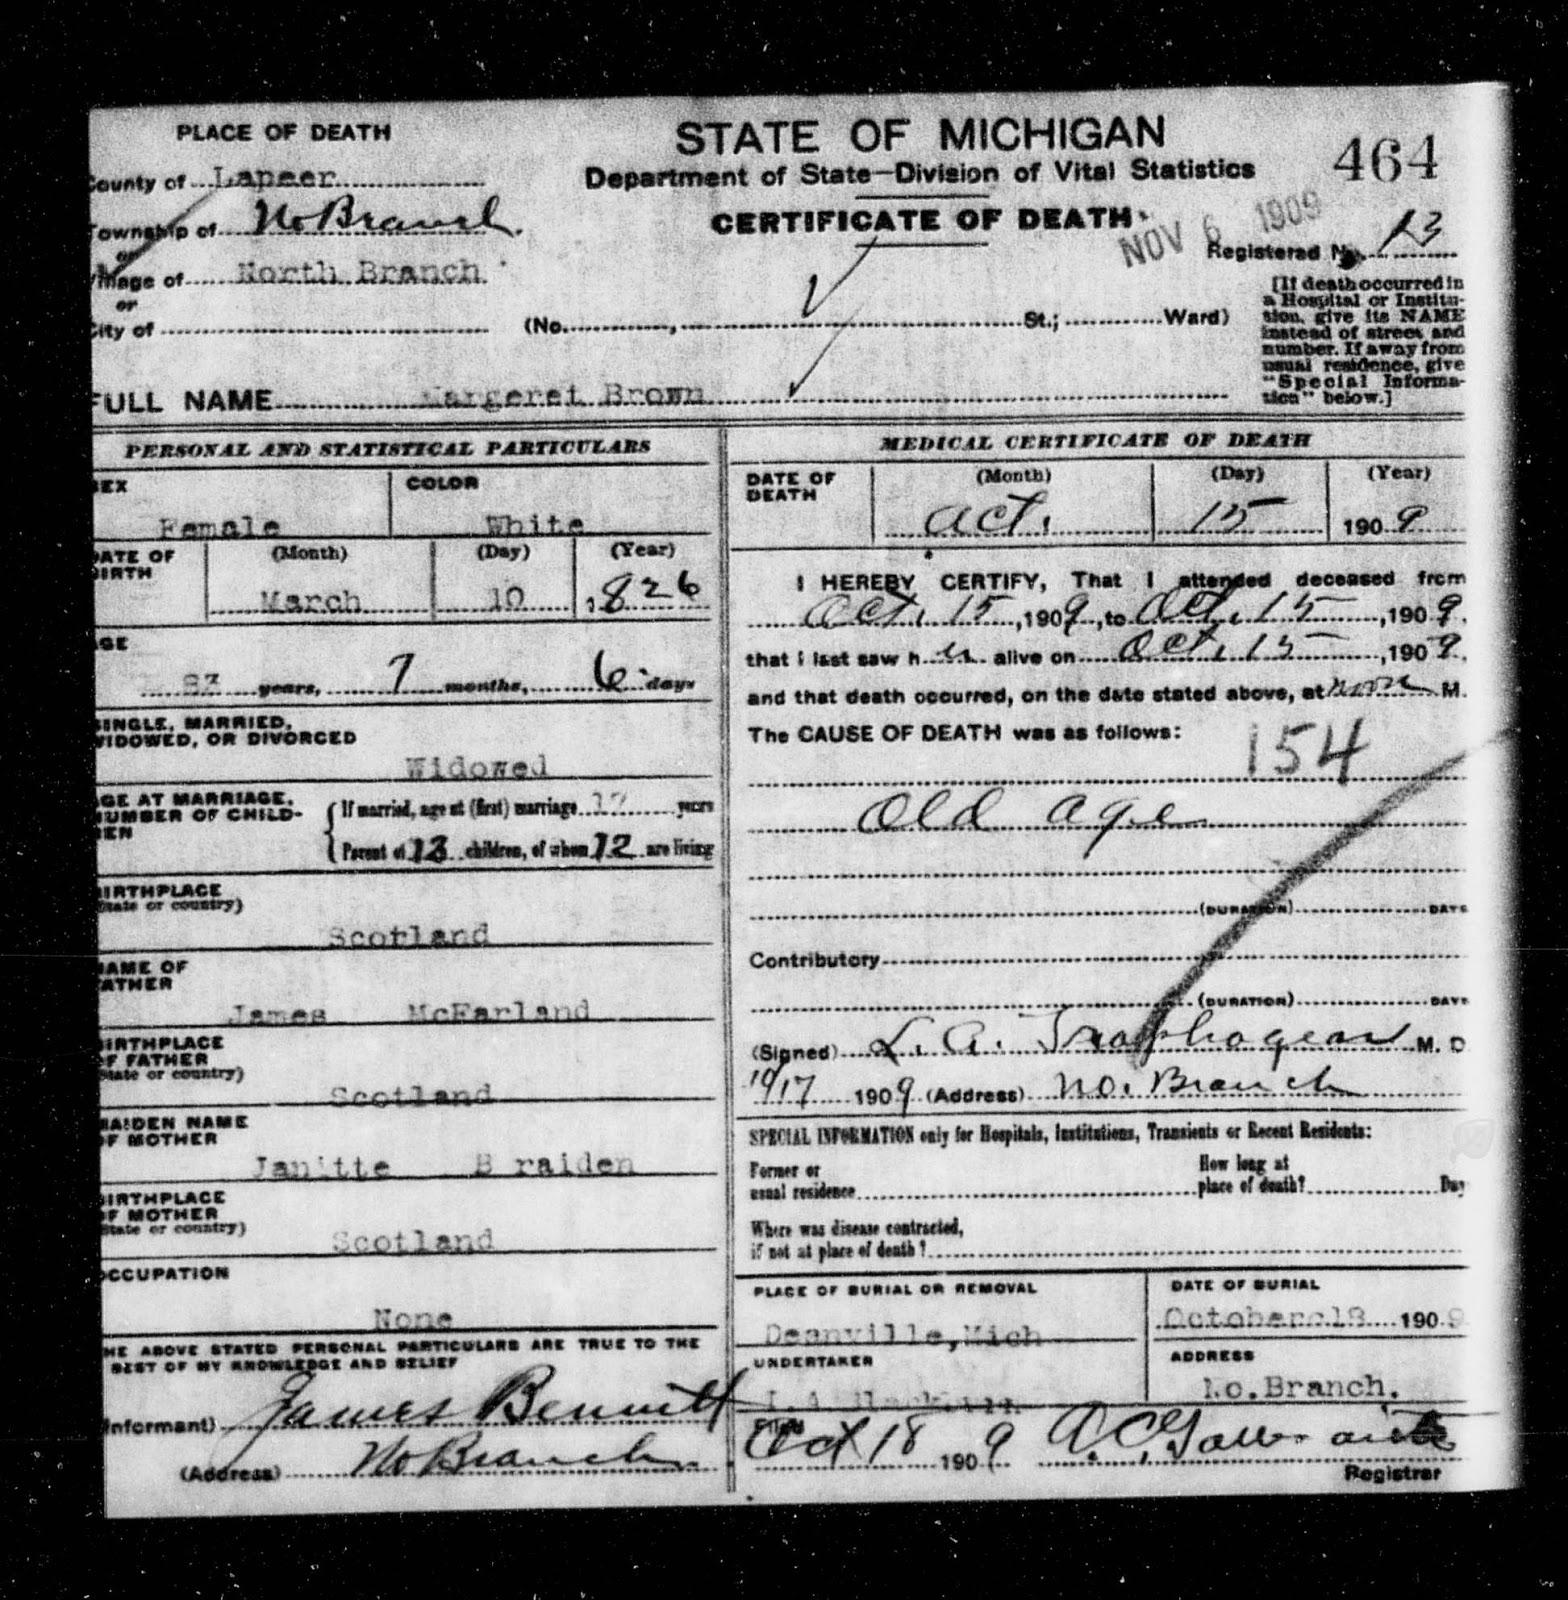 Climbing My Family Tree: Death Certificate for Margaret McFarlane Bennett Brown 15 October 1909